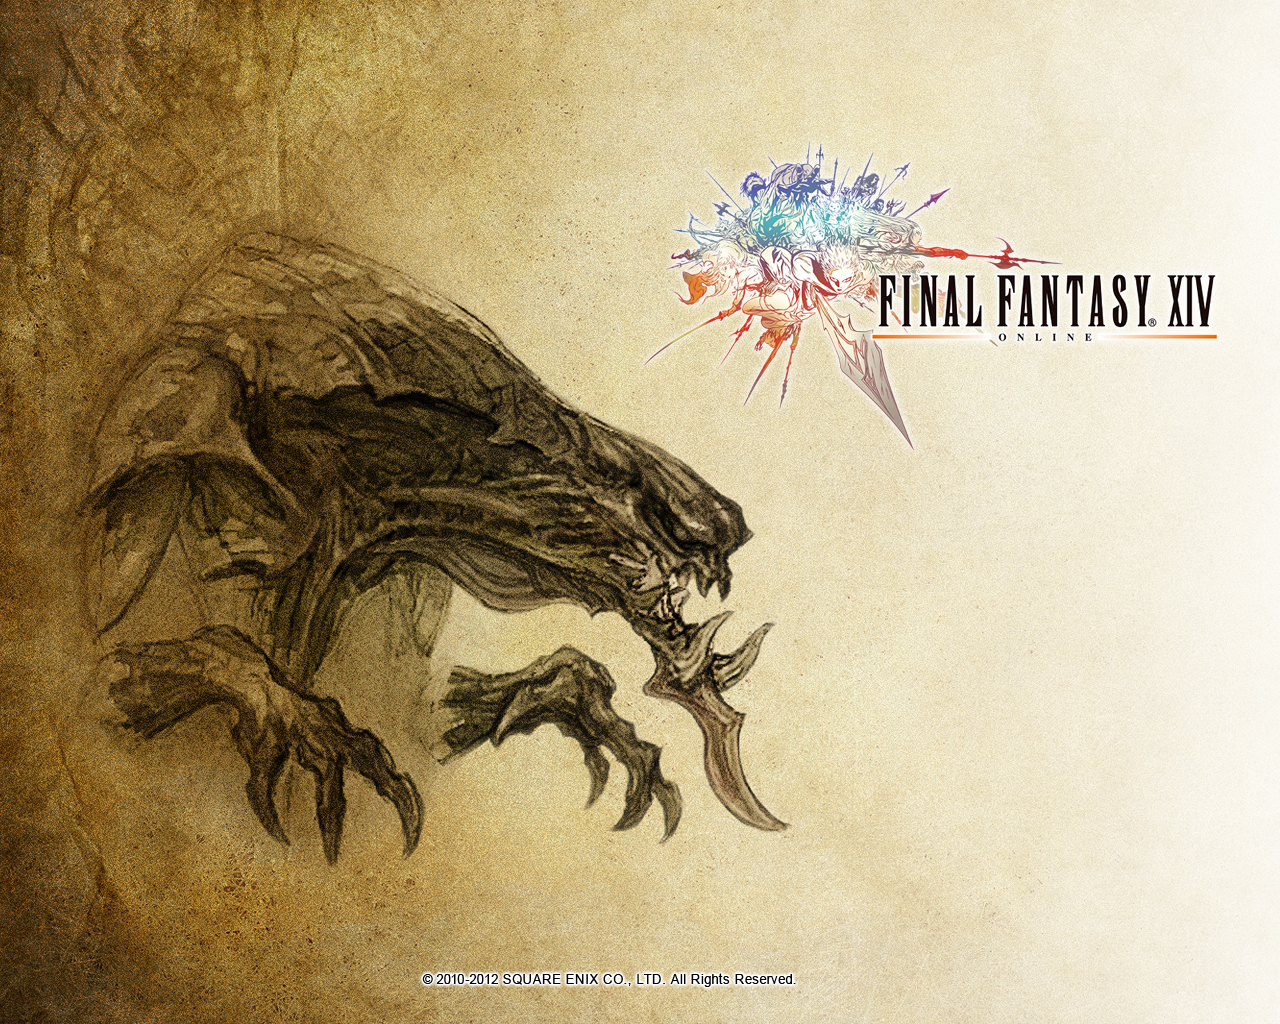 Image ffxiv wallpaper 1280x1024 demon the final fantasy wiki 10 years of having - Ffxiv wallpaper 1080p ...